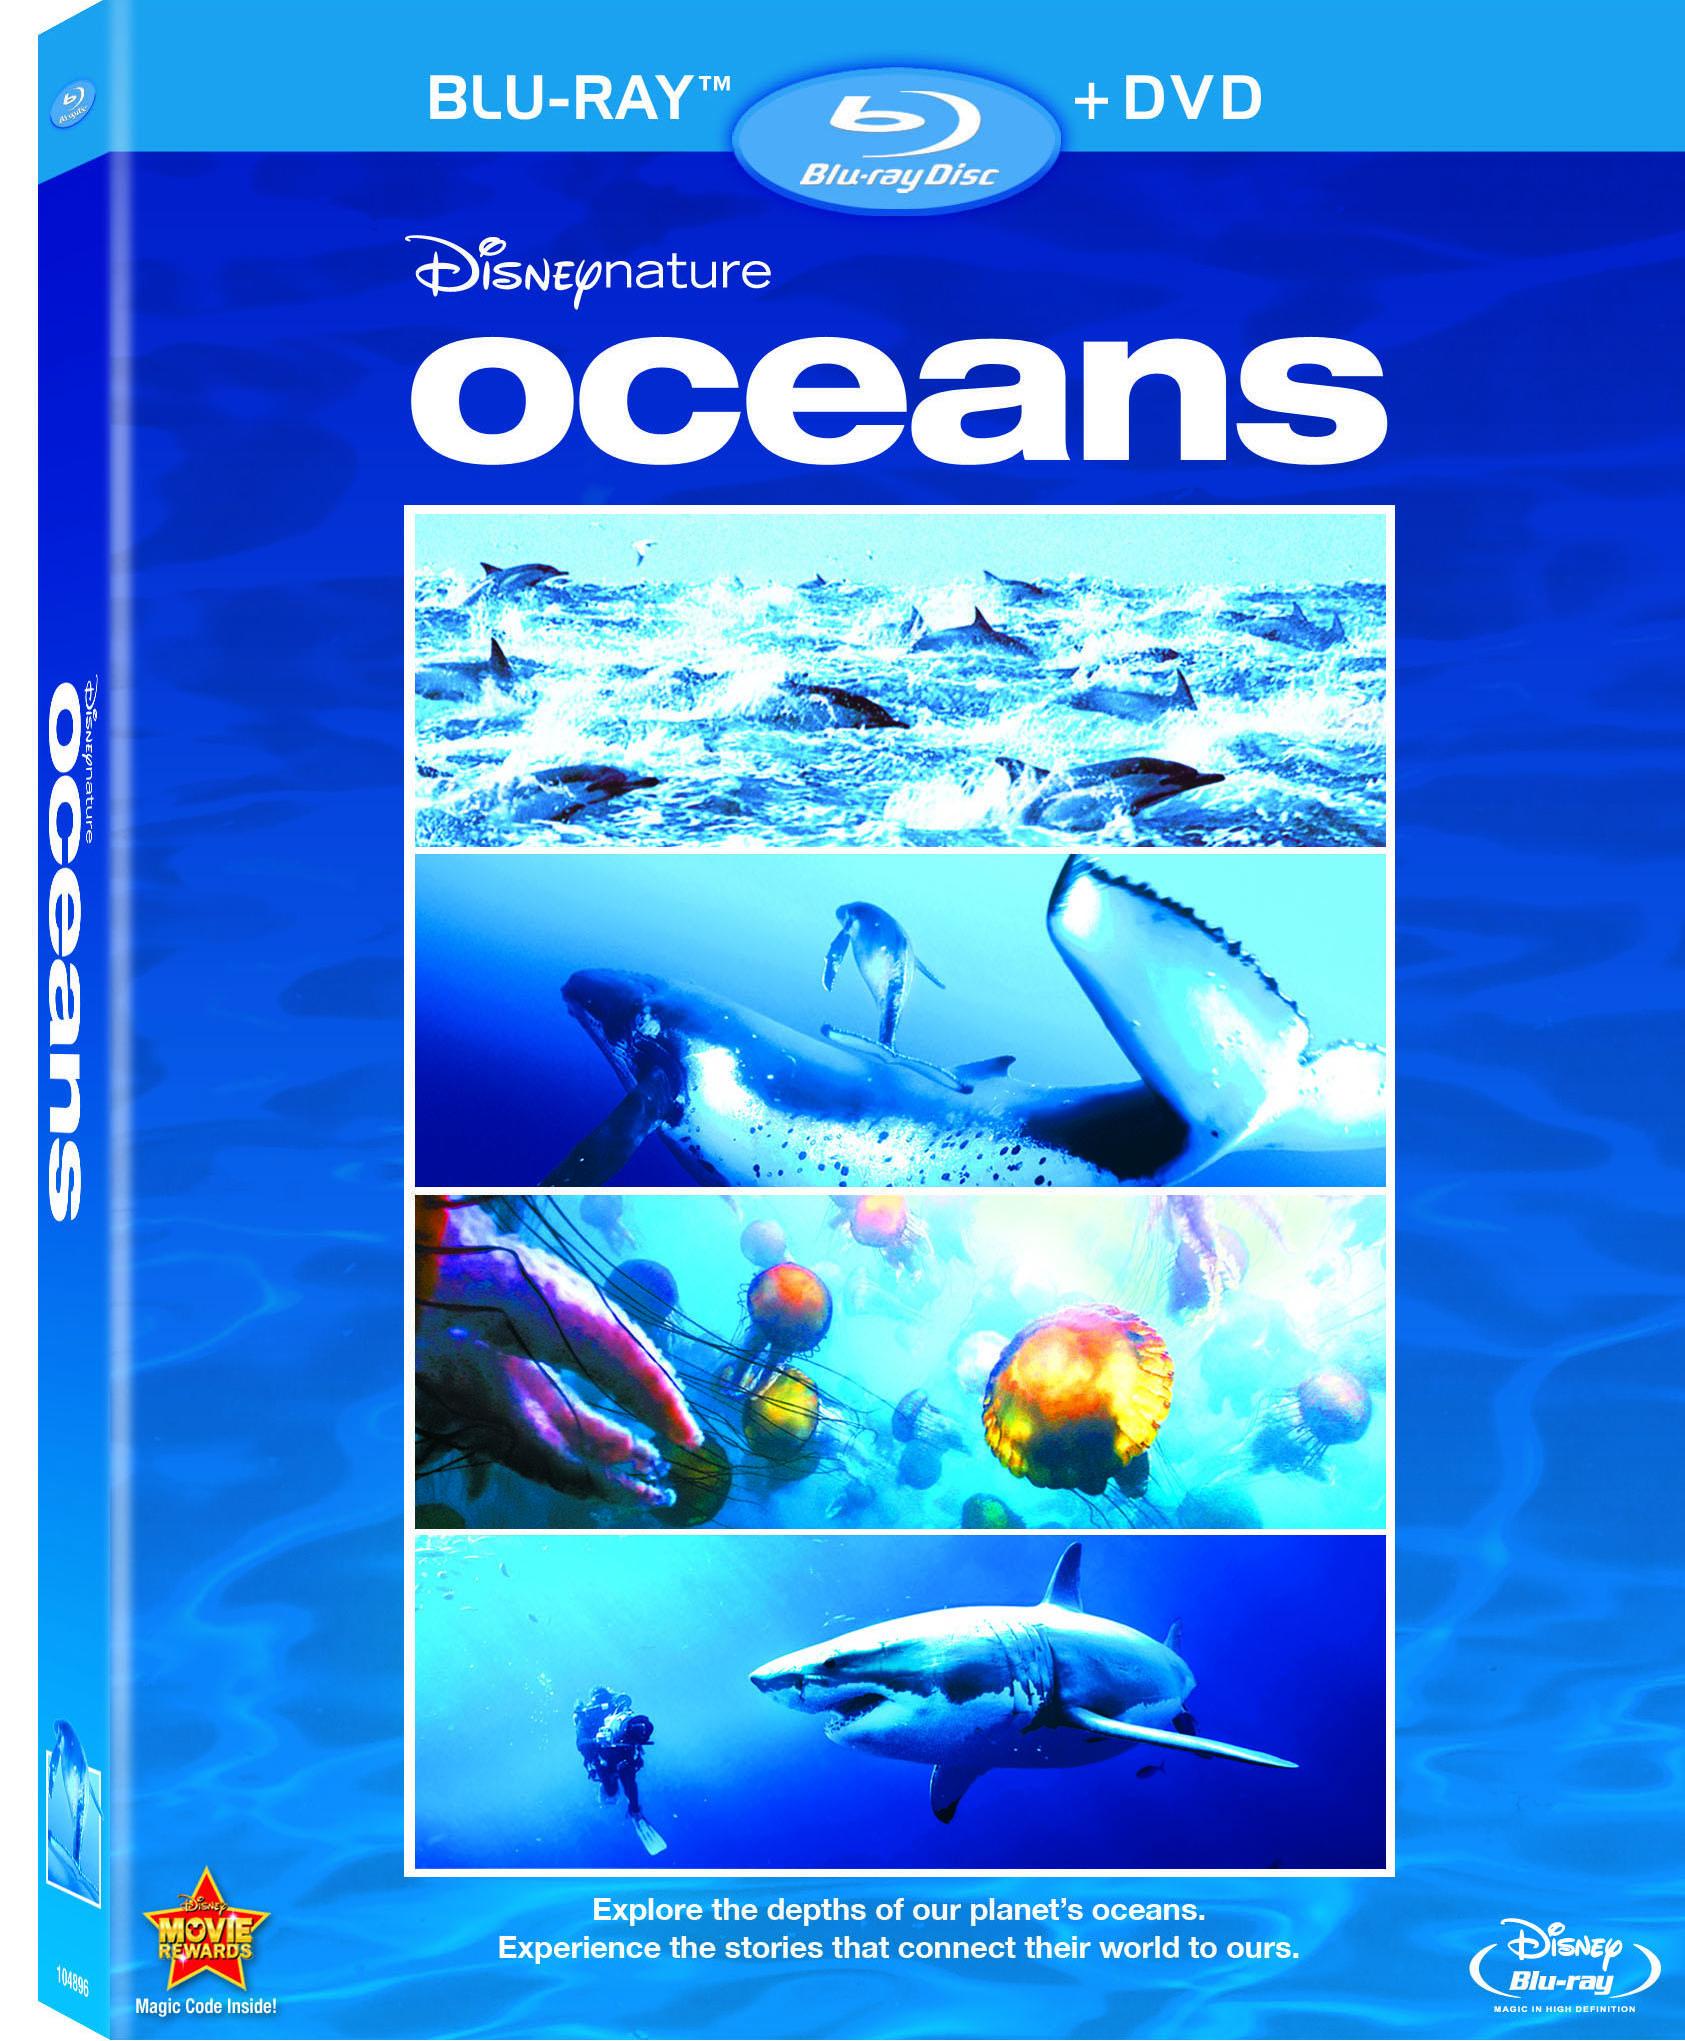 Disney-Nature-Oceans-Bluray-Combo-Art.jpg